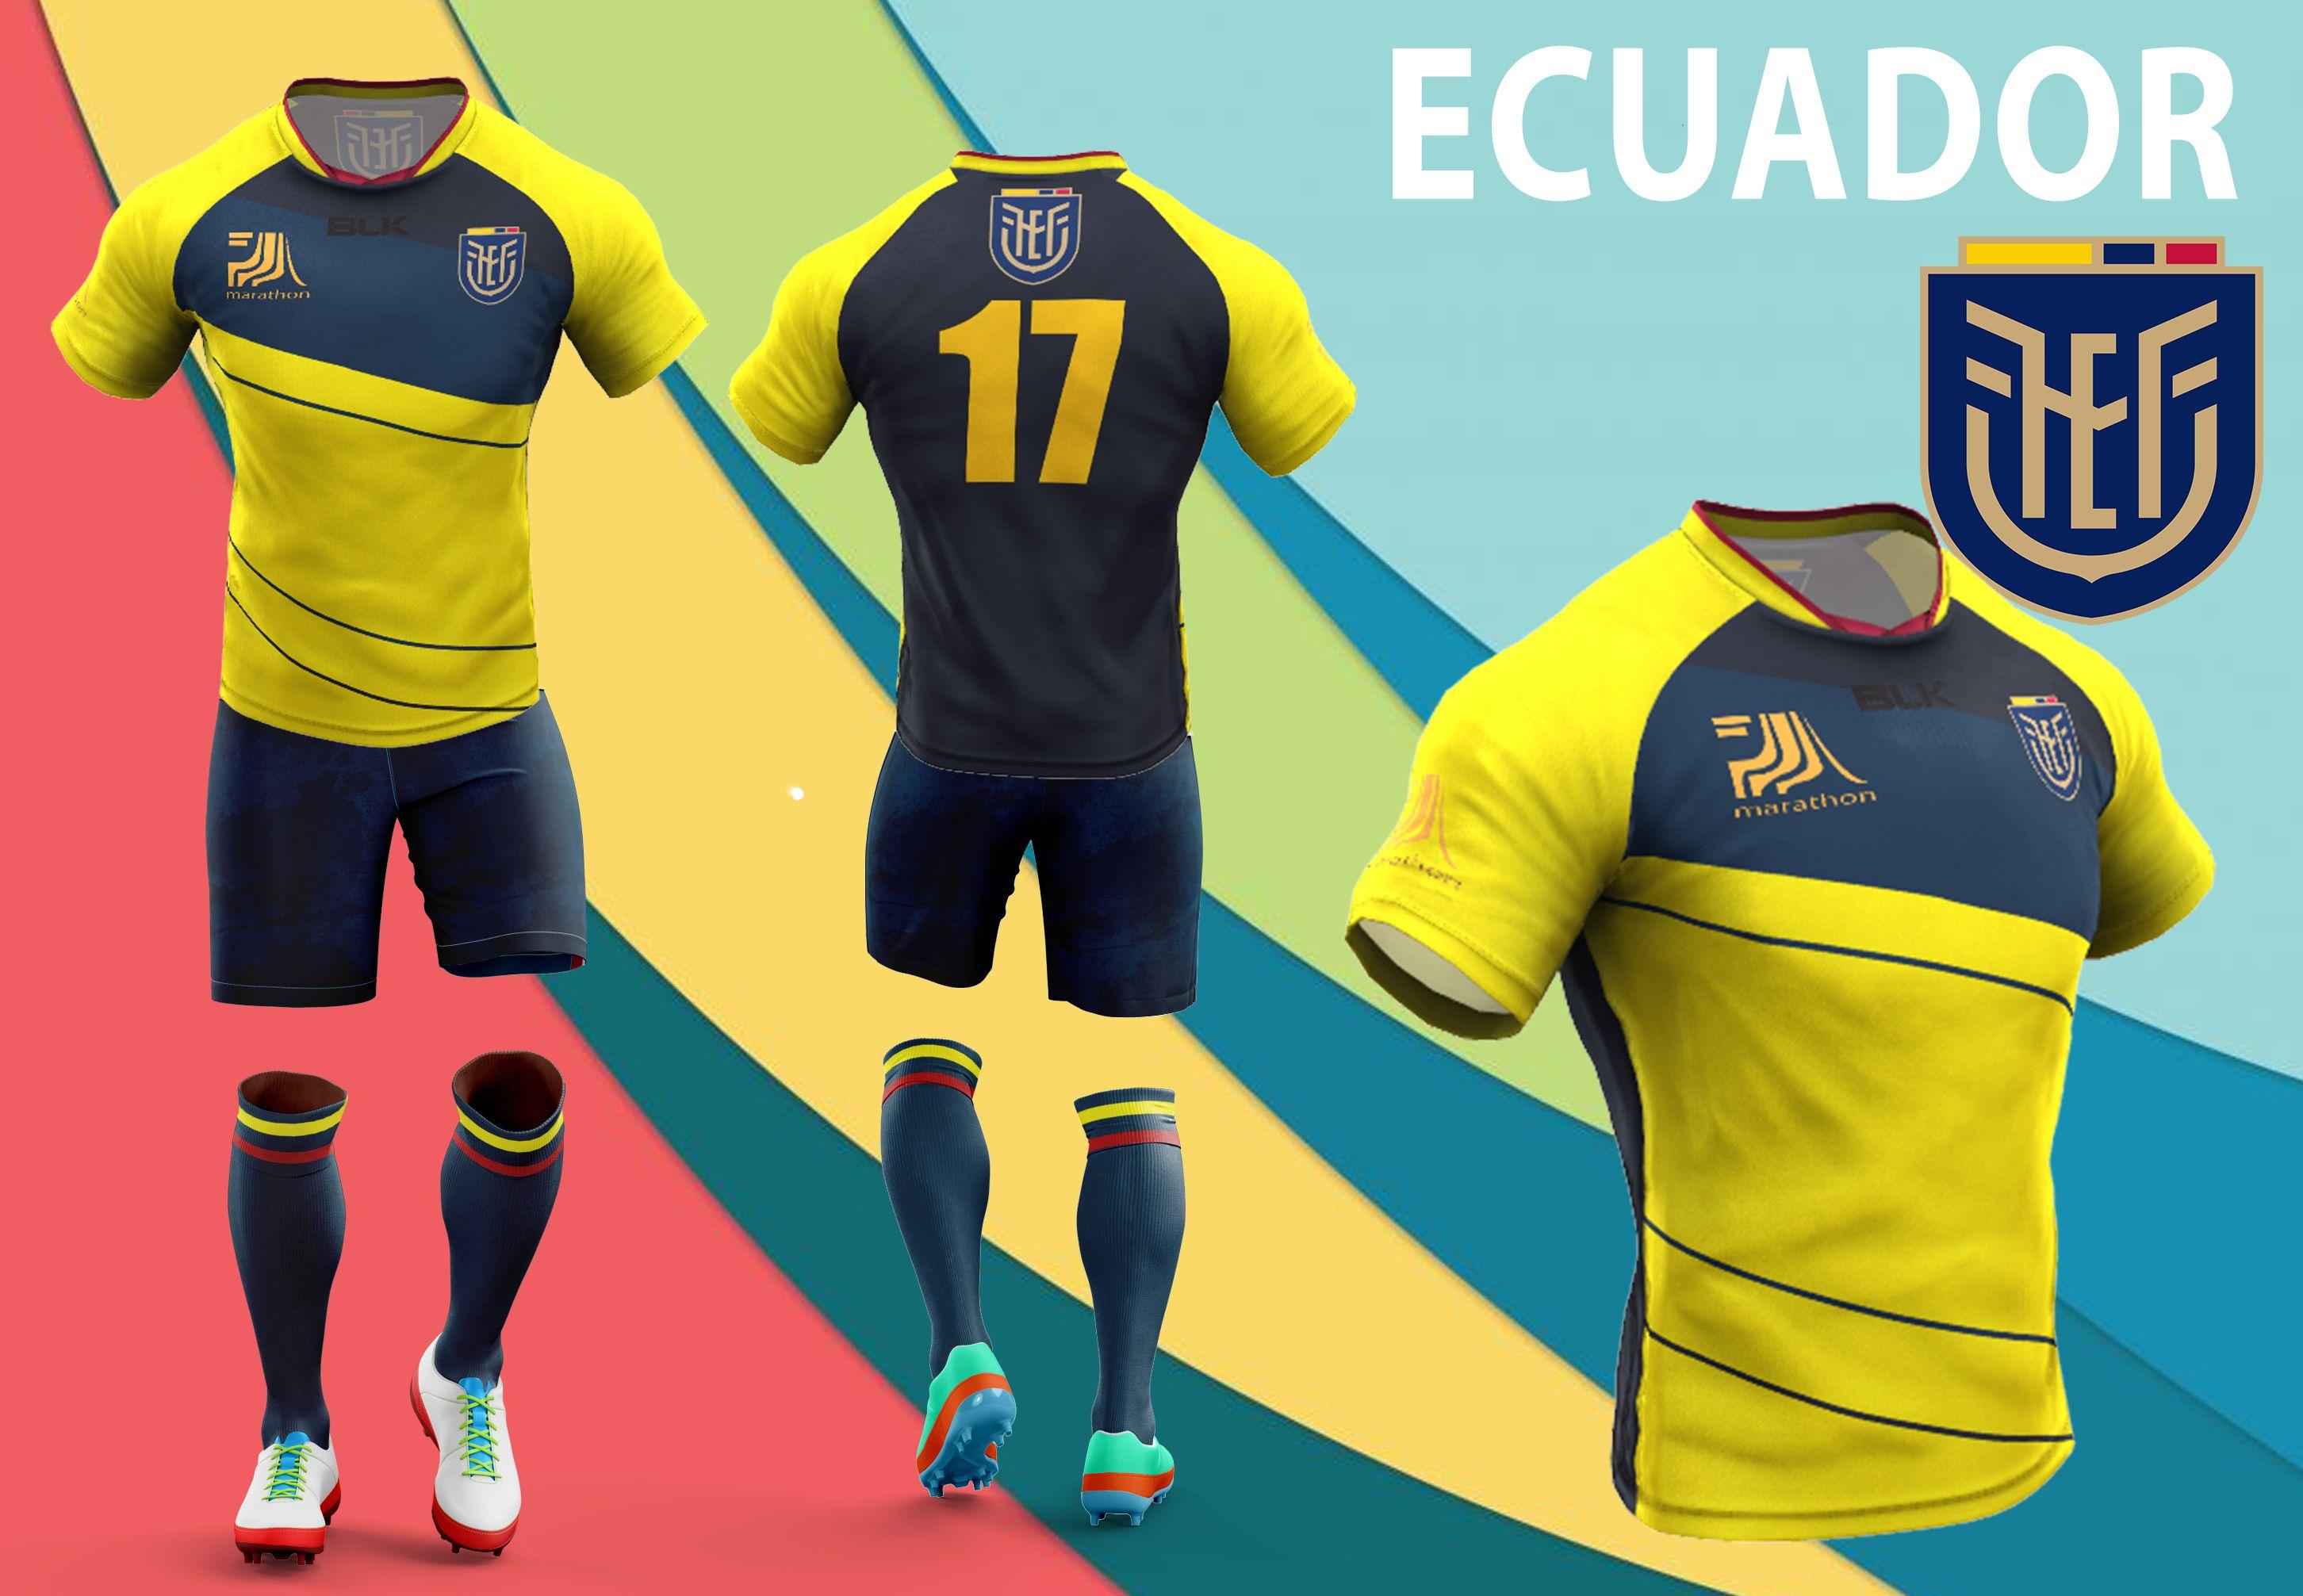 Diseno 3 Ecuador Sports Jersey Swimwear Wetsuit